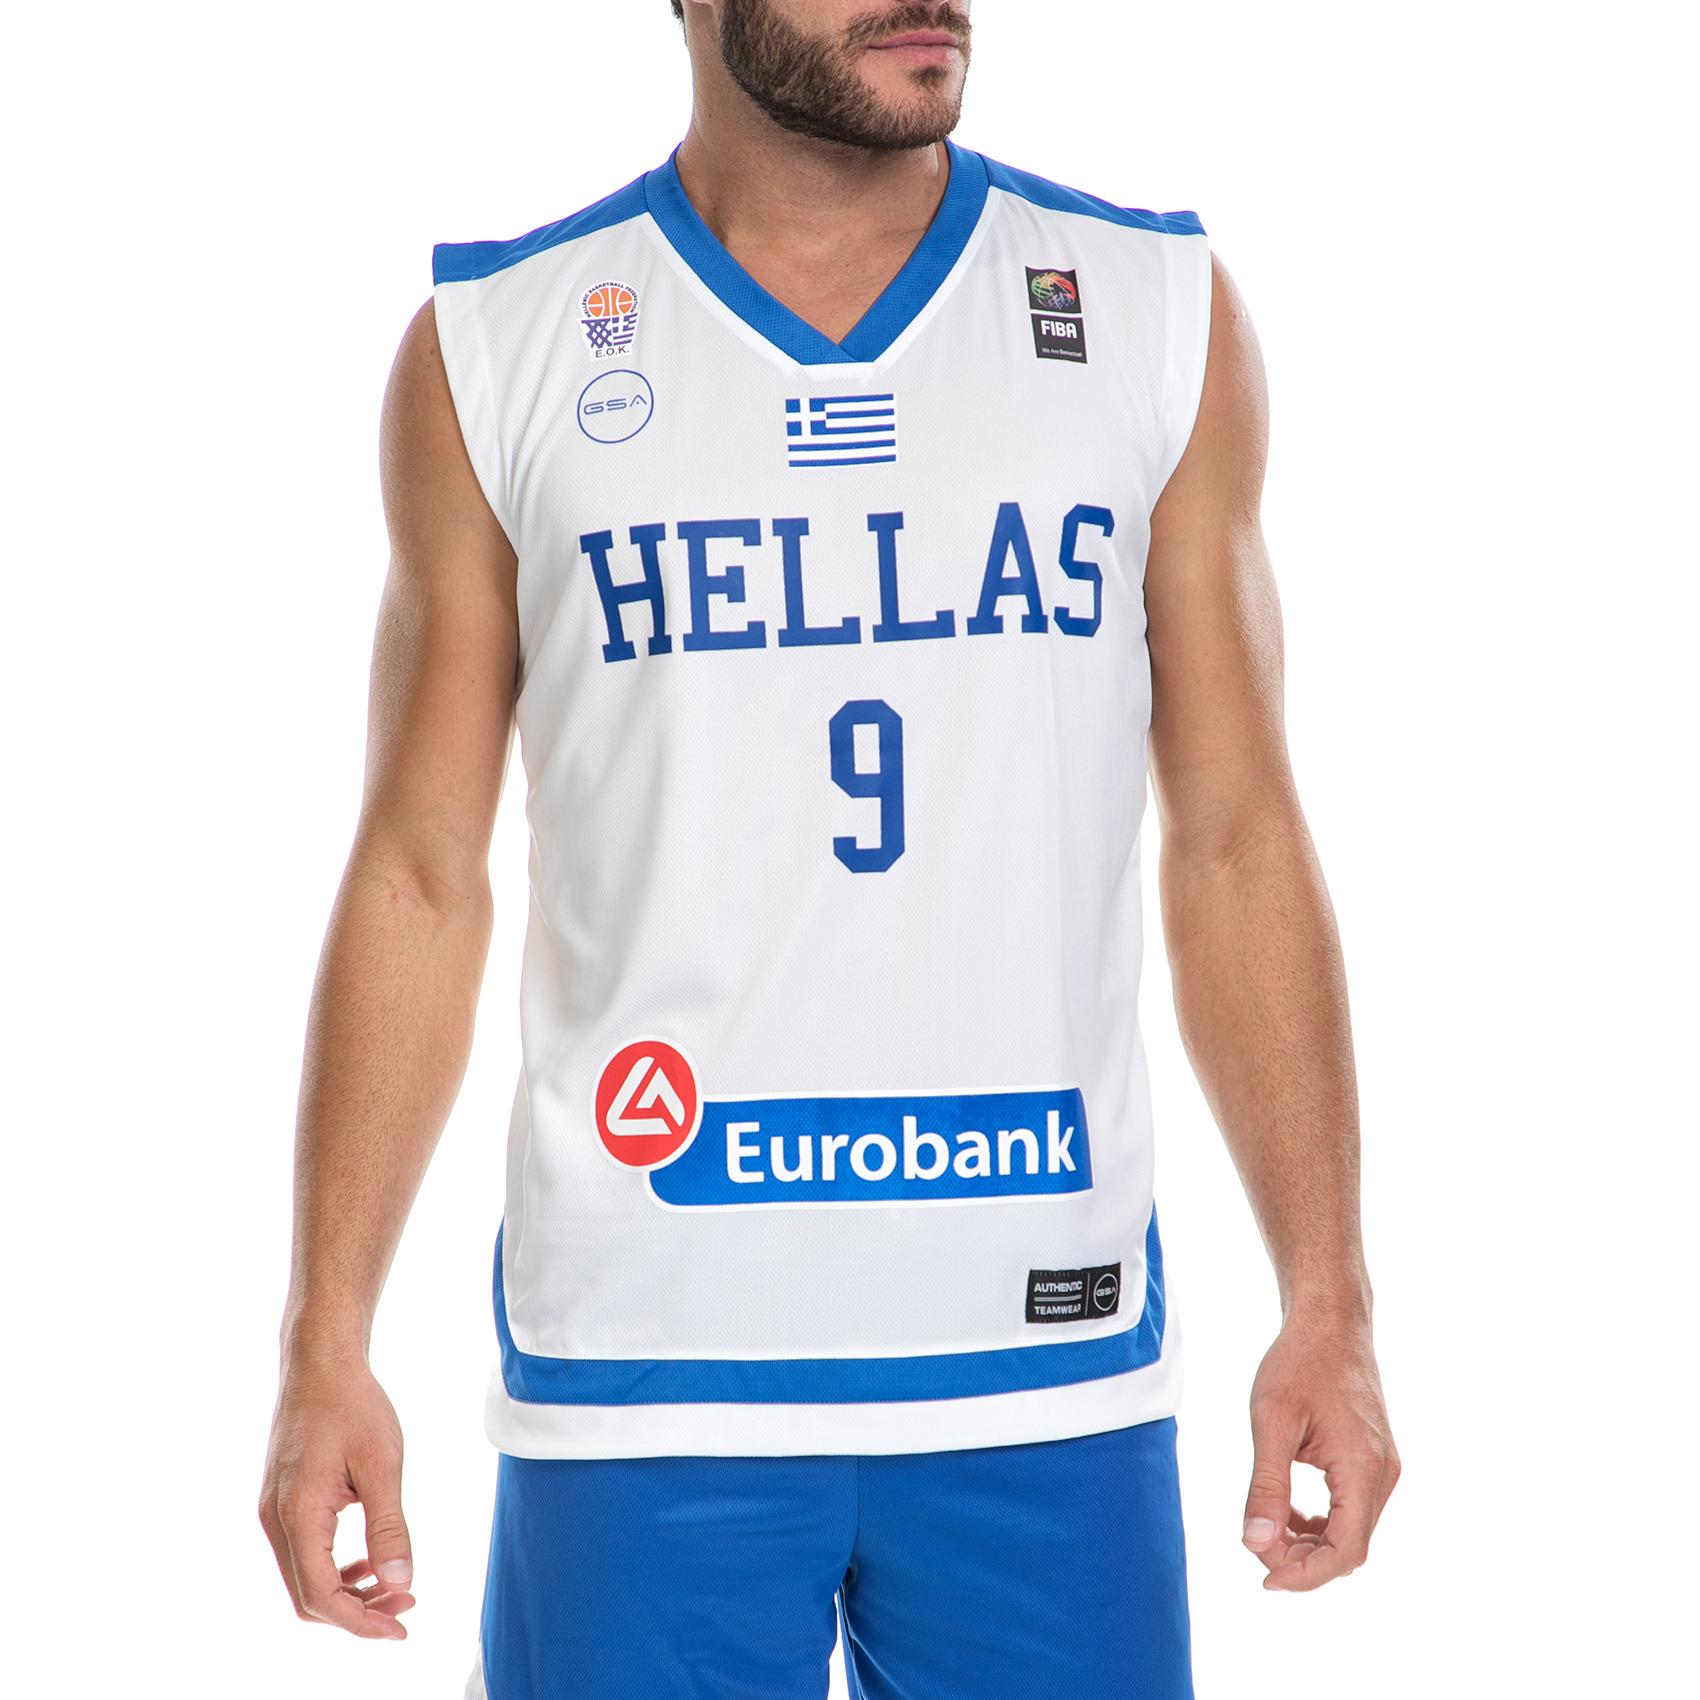 GSA - Ανδρική μπλούζα της Εθνικής Ελλάδος Basket ΜΠΟΥΡΟΥΣΗ λευκή ανδρικά ρούχα αθλητικά t shirt